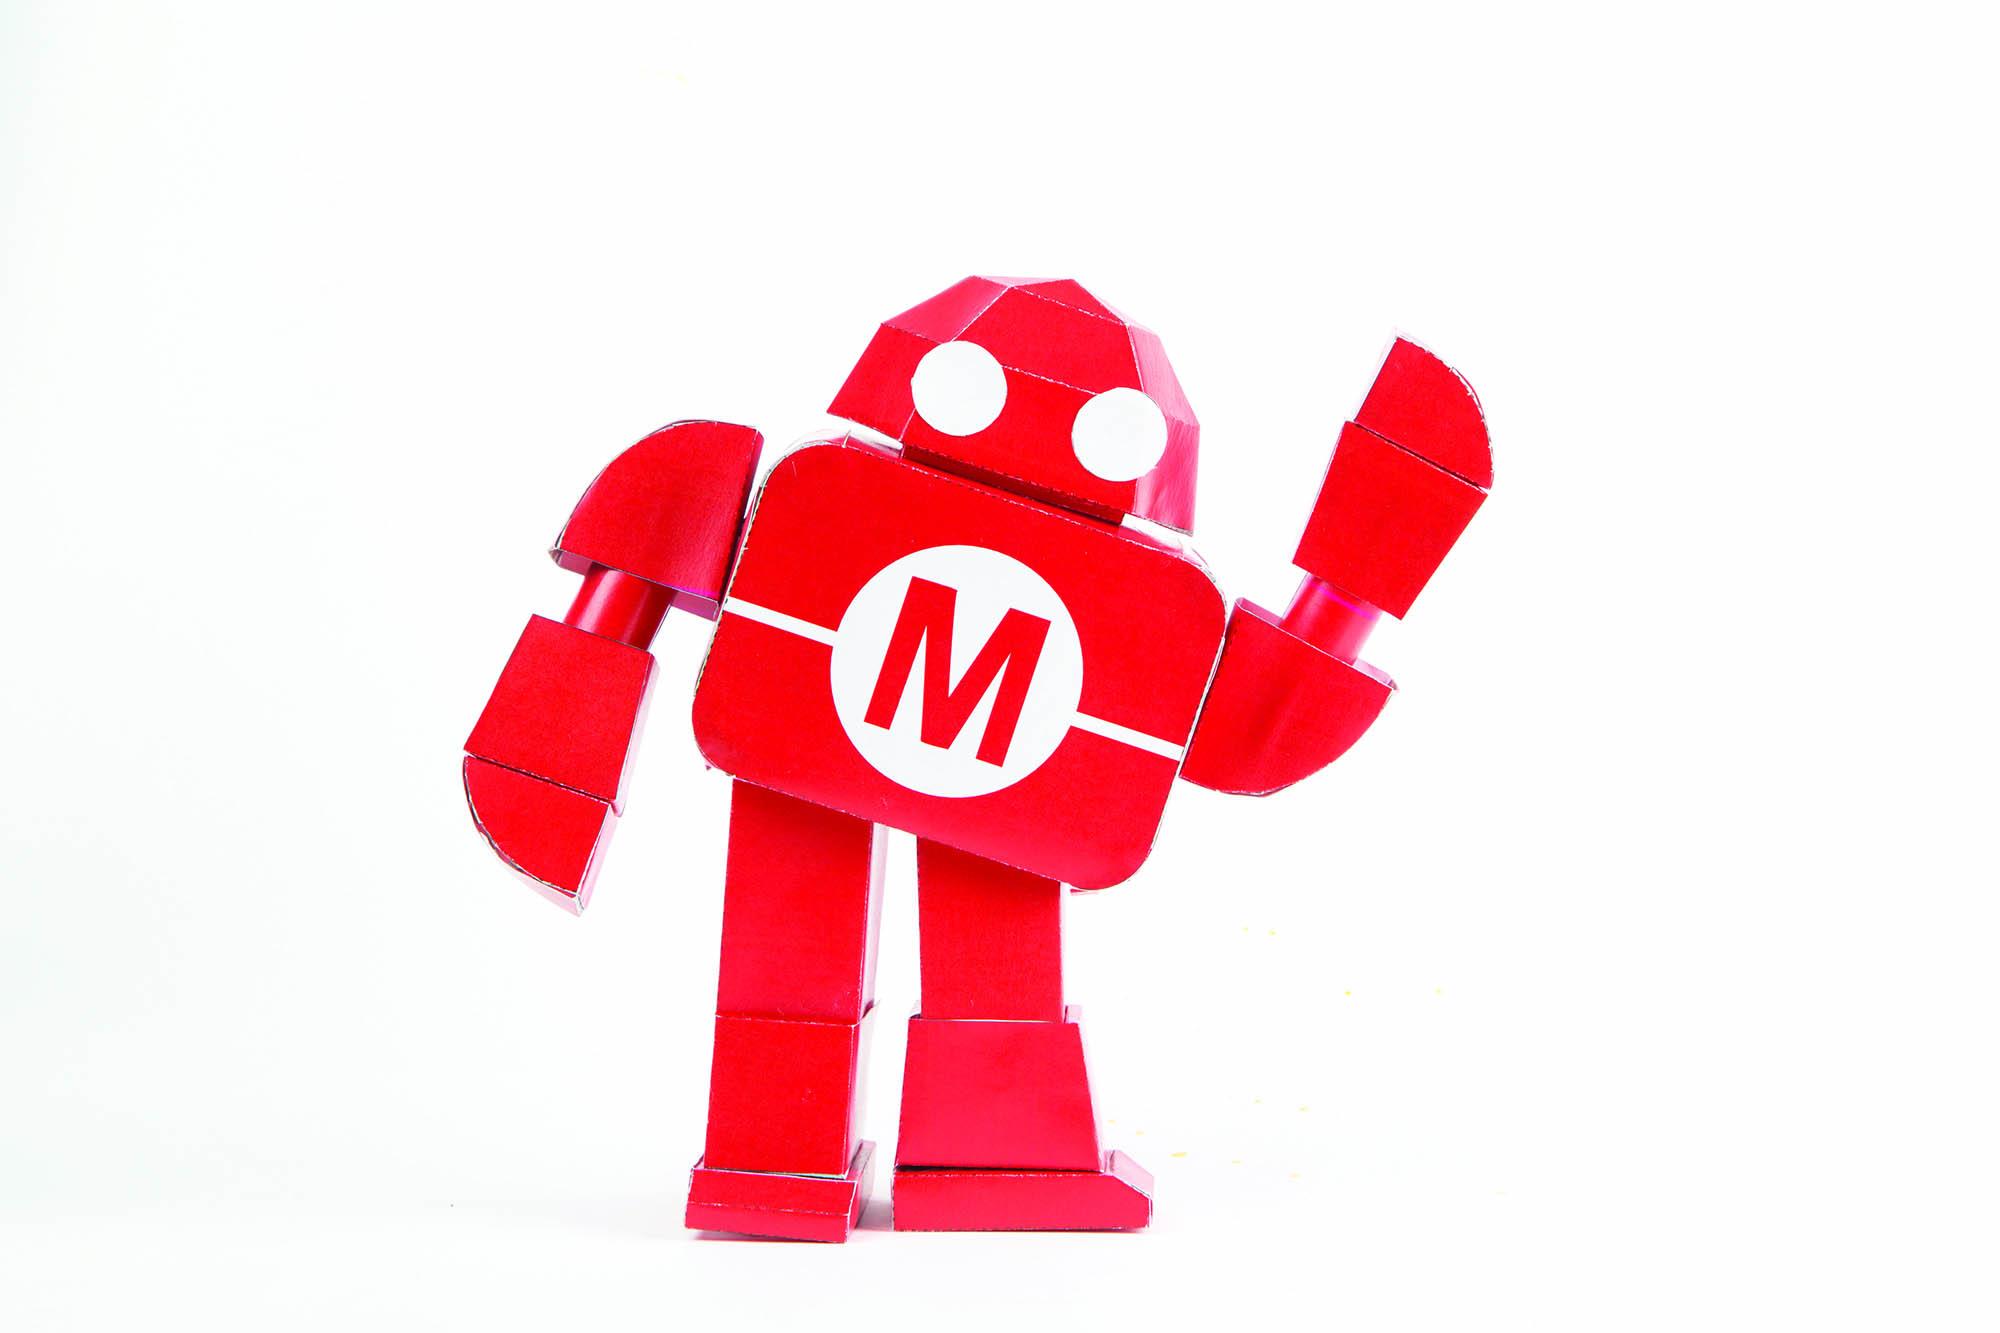 DIY Posable Papercraft Makey Mascot